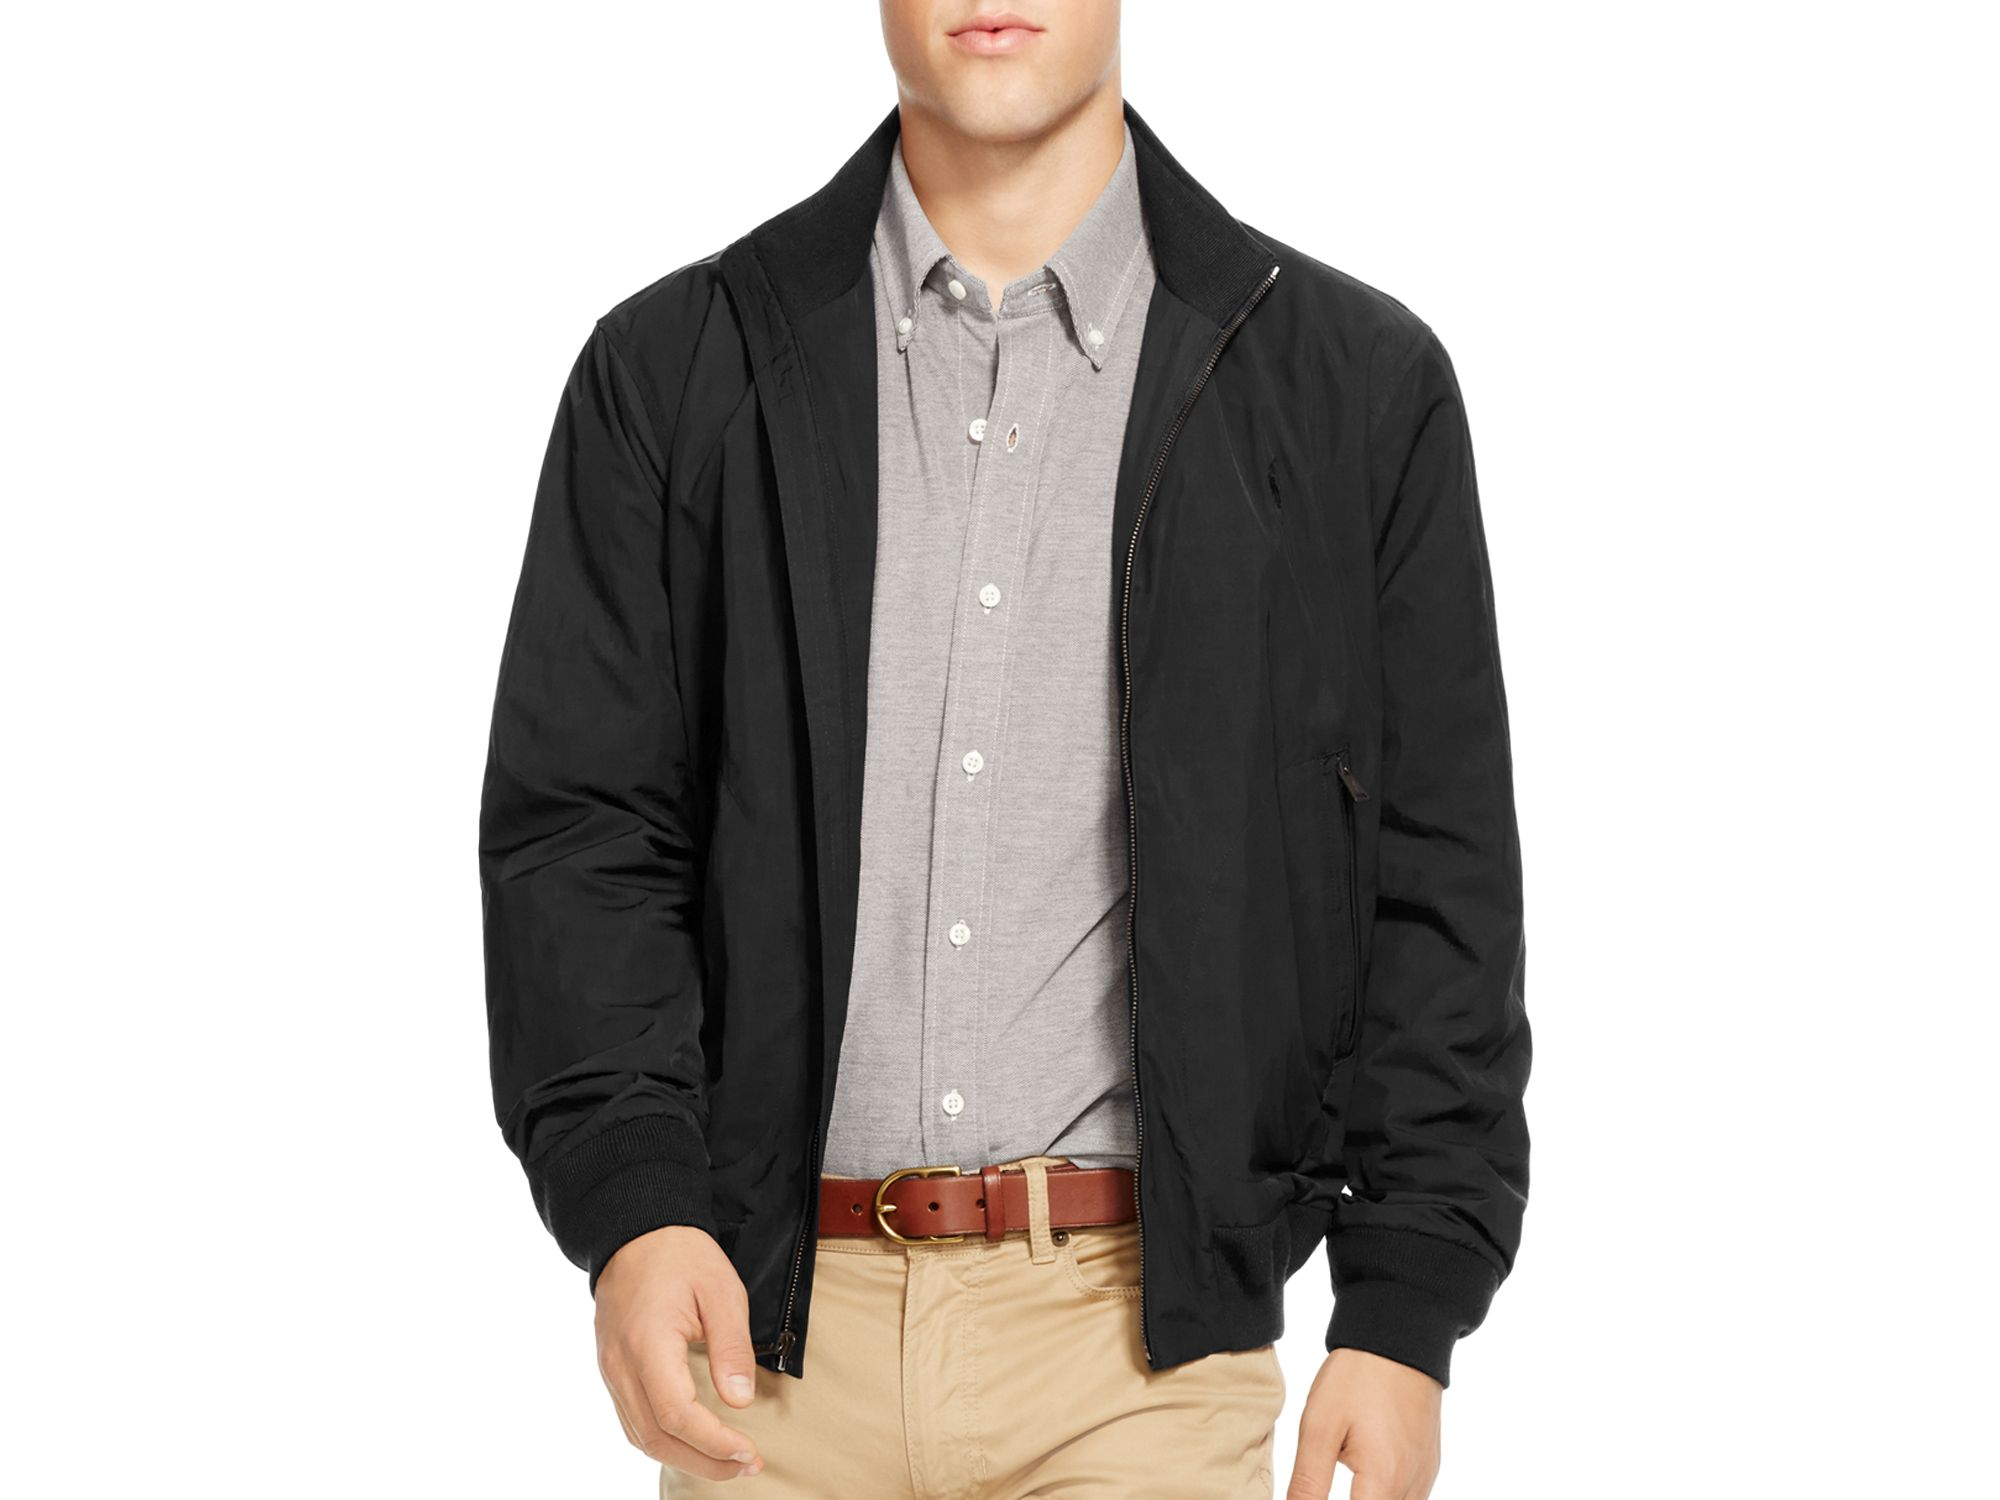 polo ralph lauren nylon barracuda jacket in black for men lyst. Black Bedroom Furniture Sets. Home Design Ideas